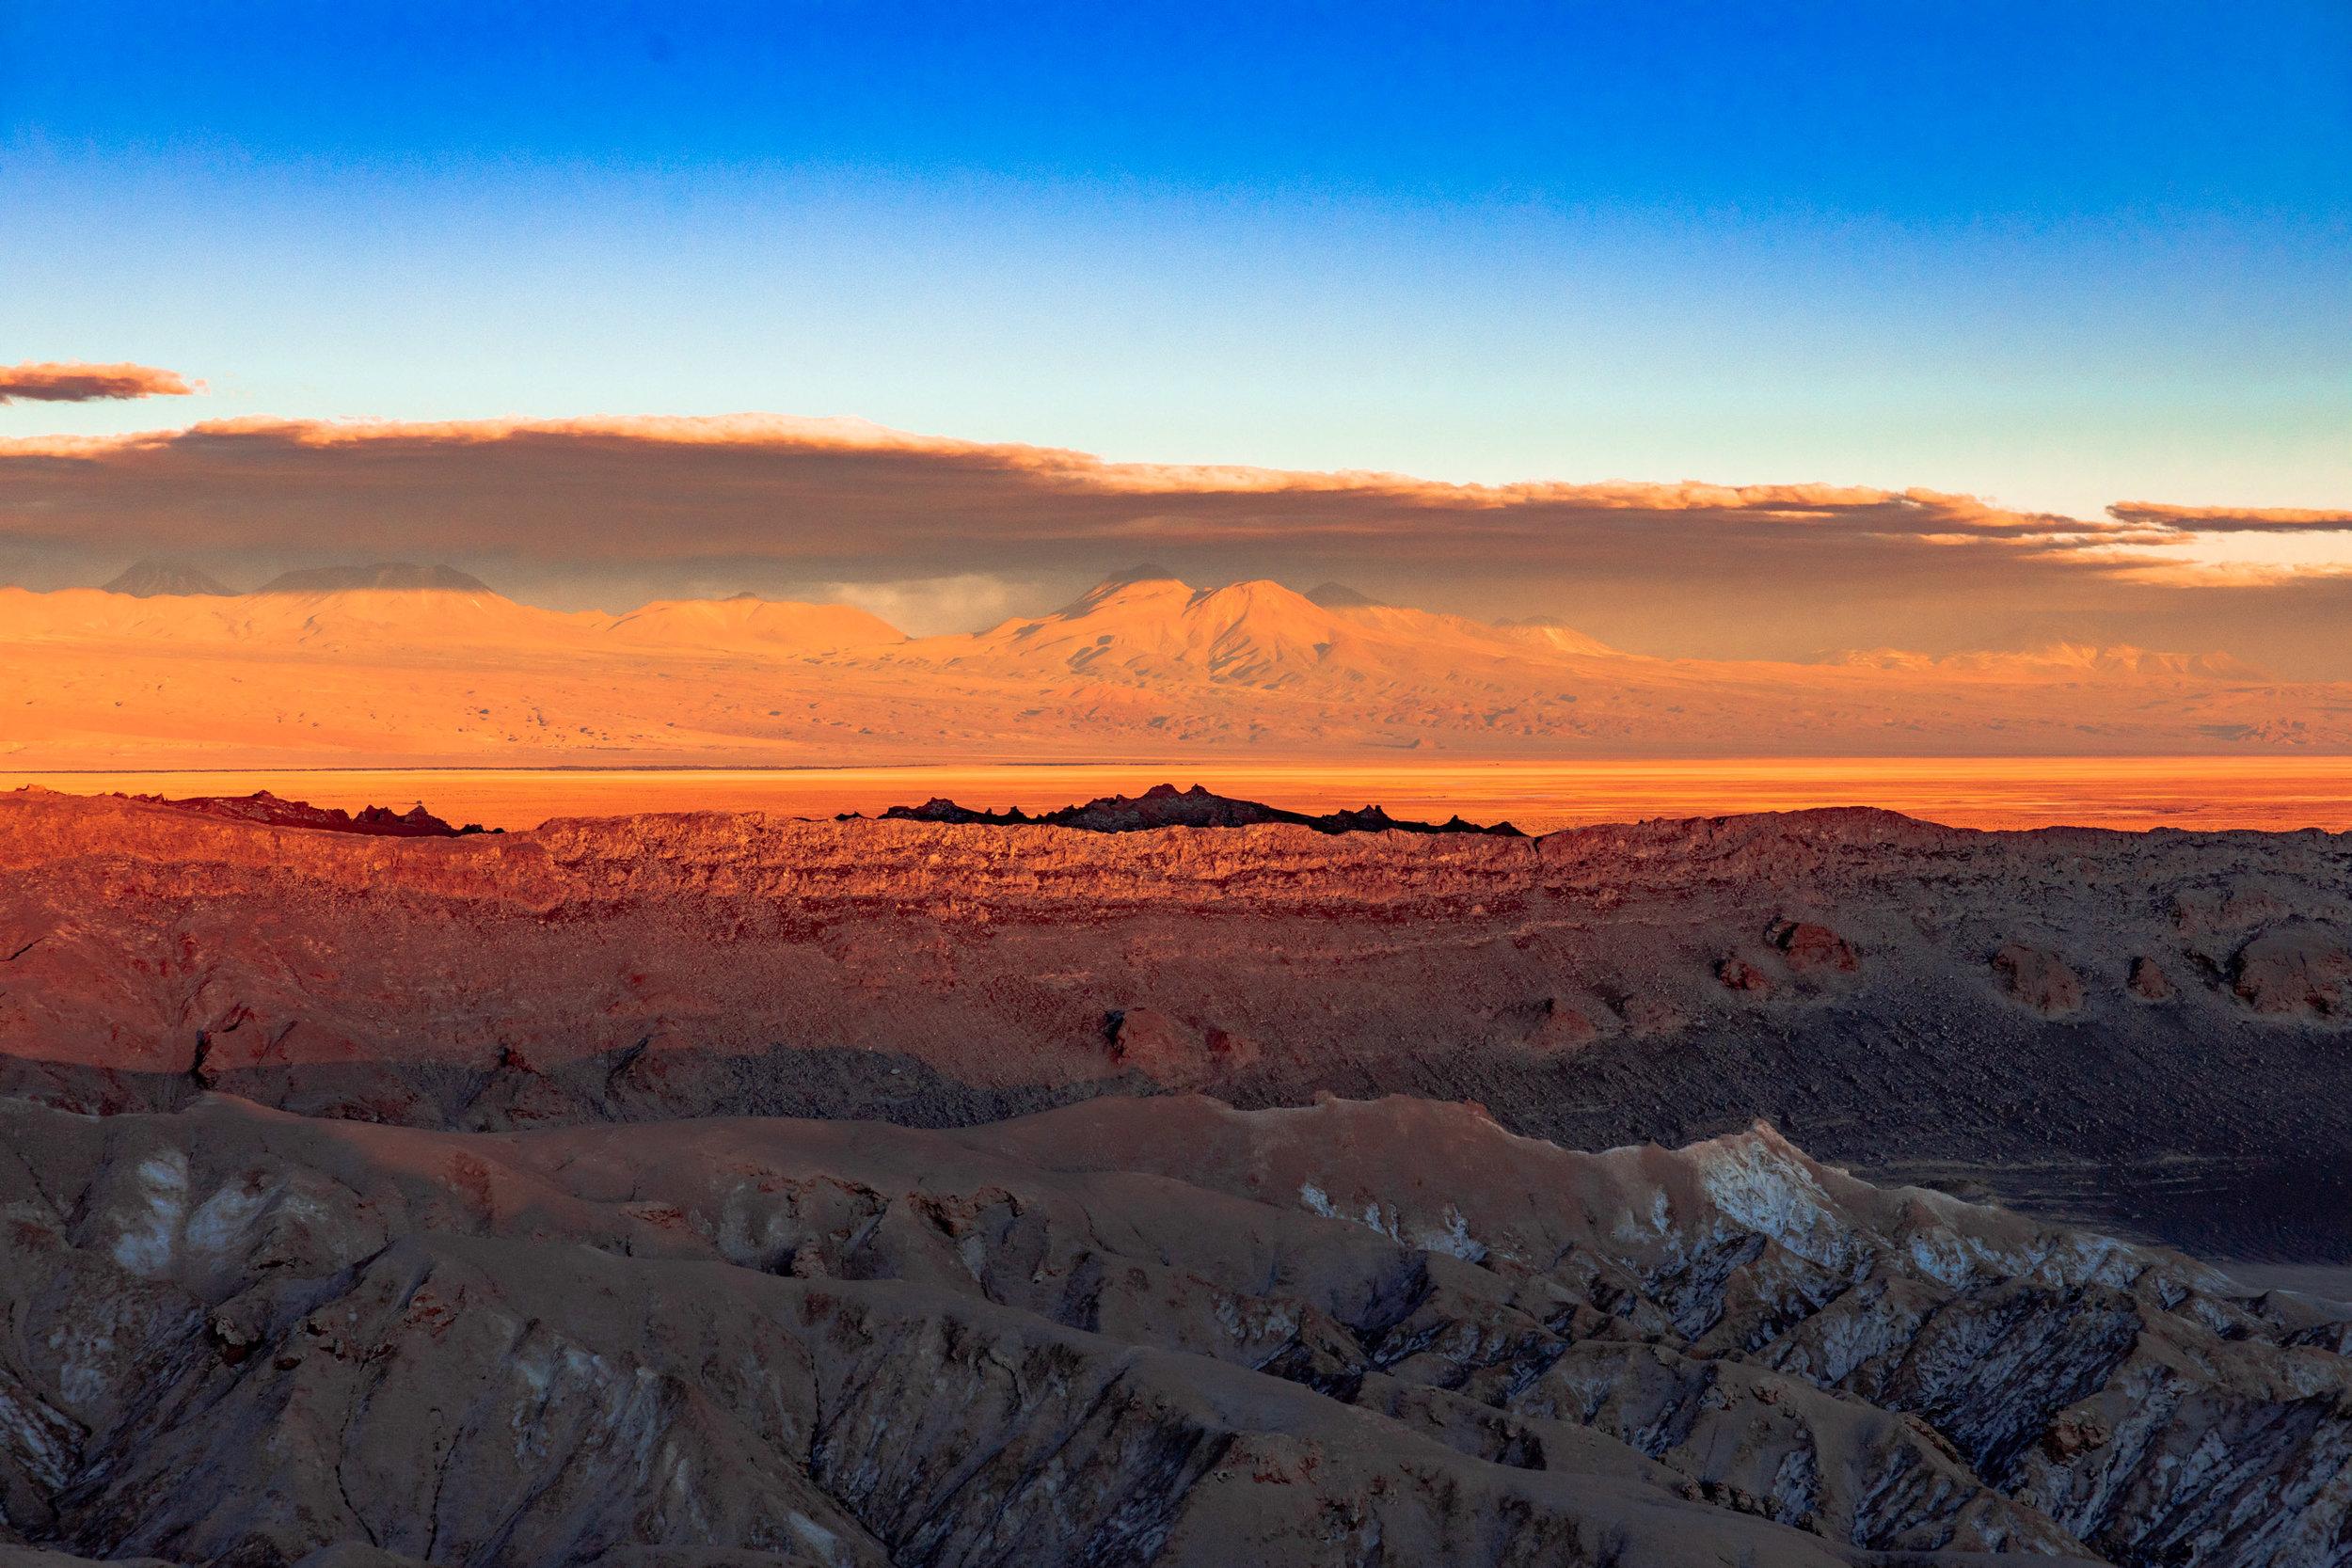 evanbdudley-Chile-Eclipse-19-0212.jpg